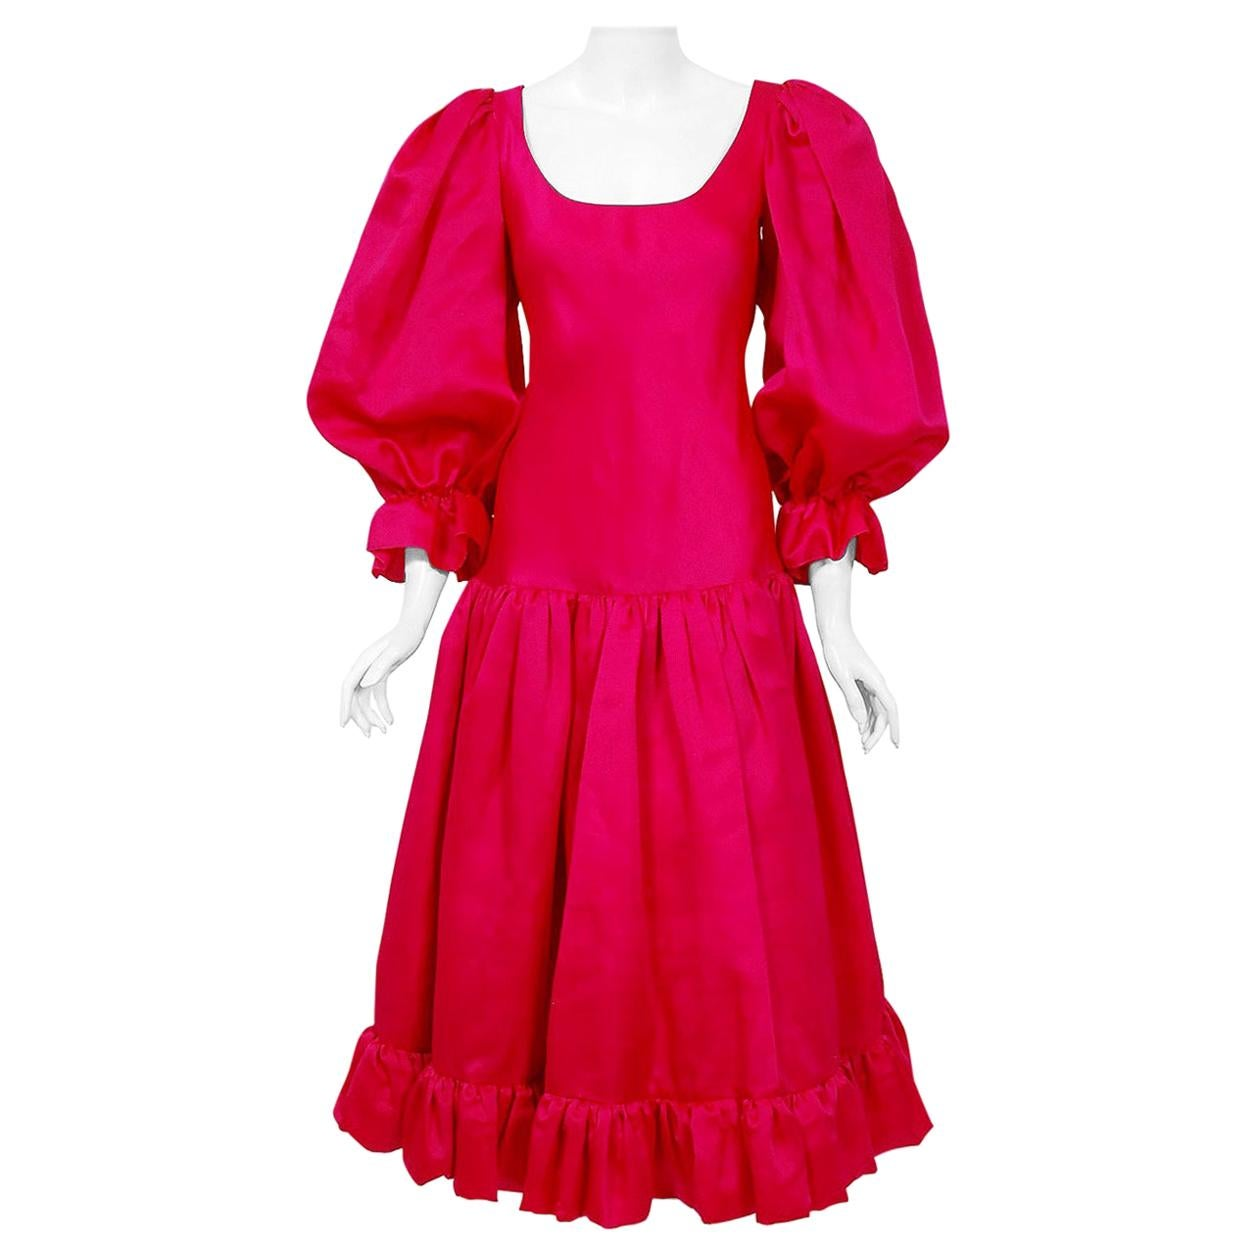 Vintage 1990's Oscar de la Renta Pink Silk Puff-Sleeve Voluminous Ruffle Dress